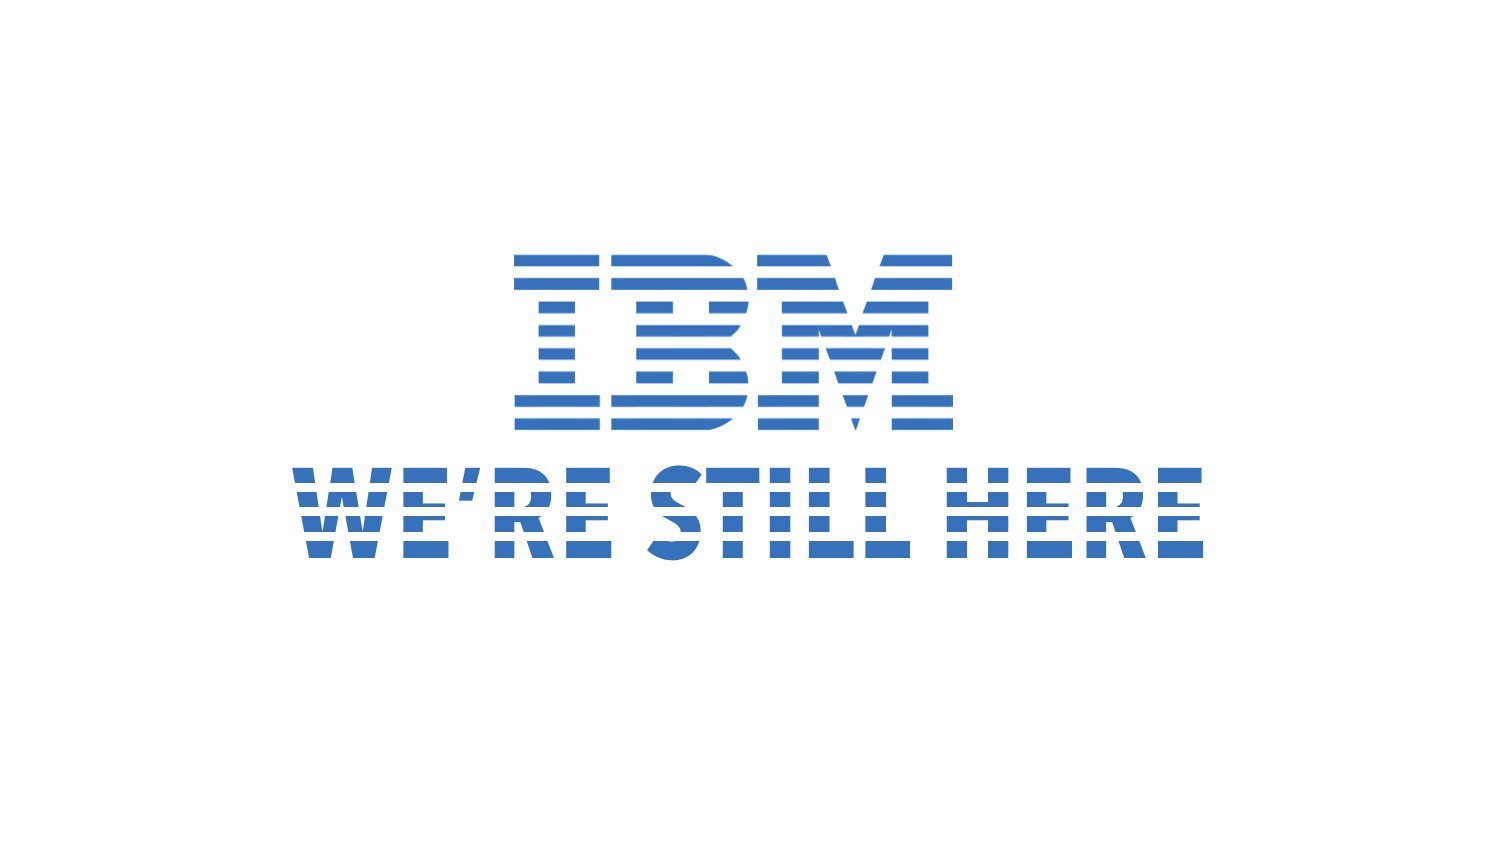 IBM We are still here